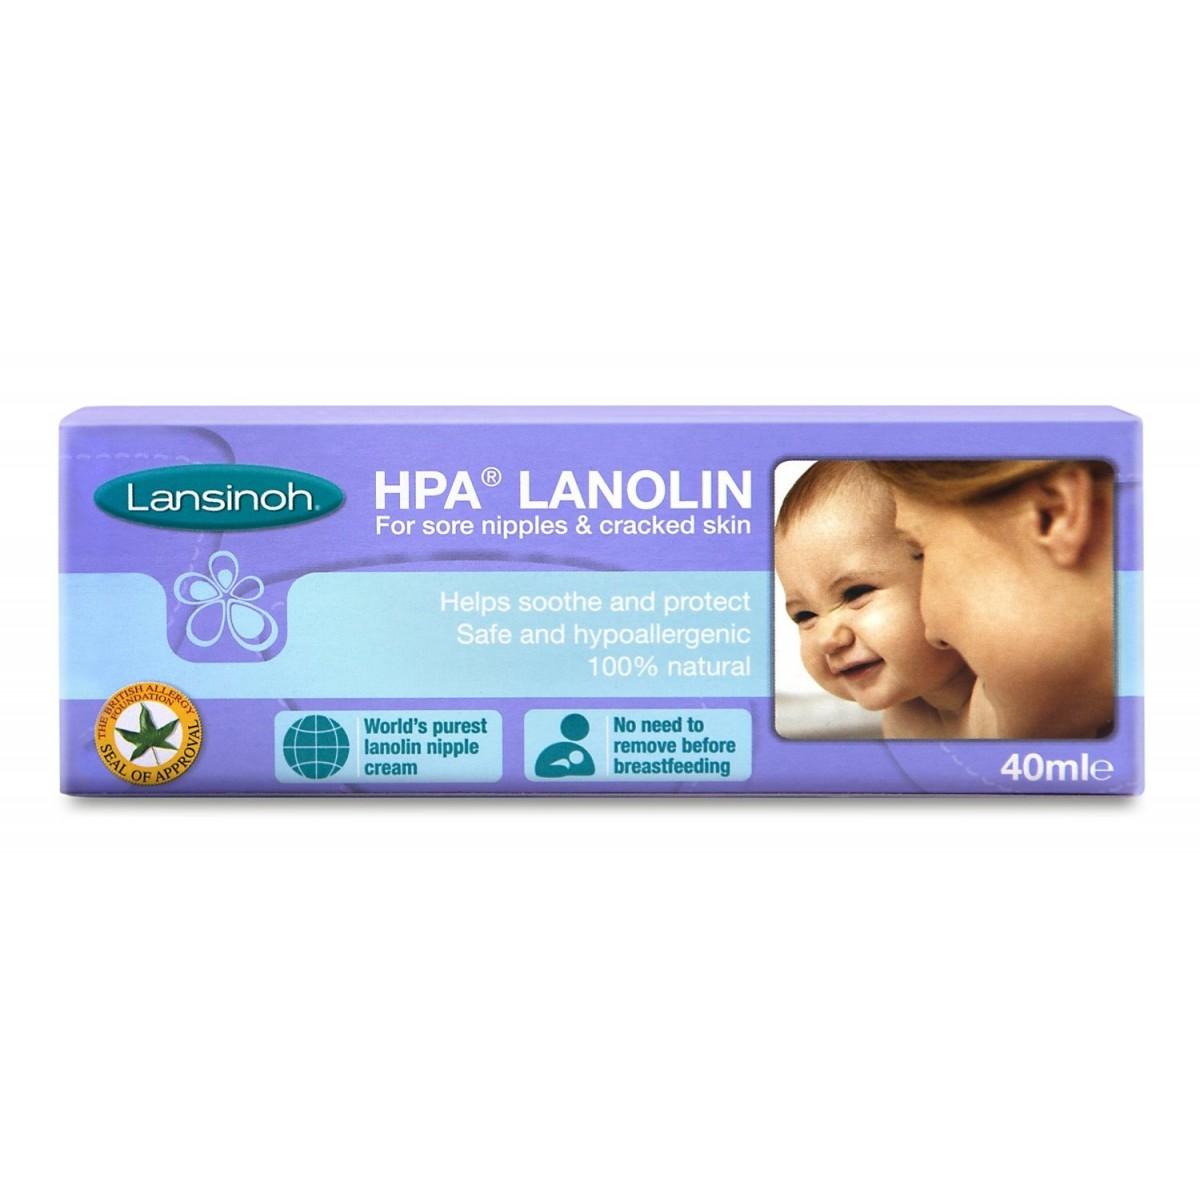 hpa lanolin prix